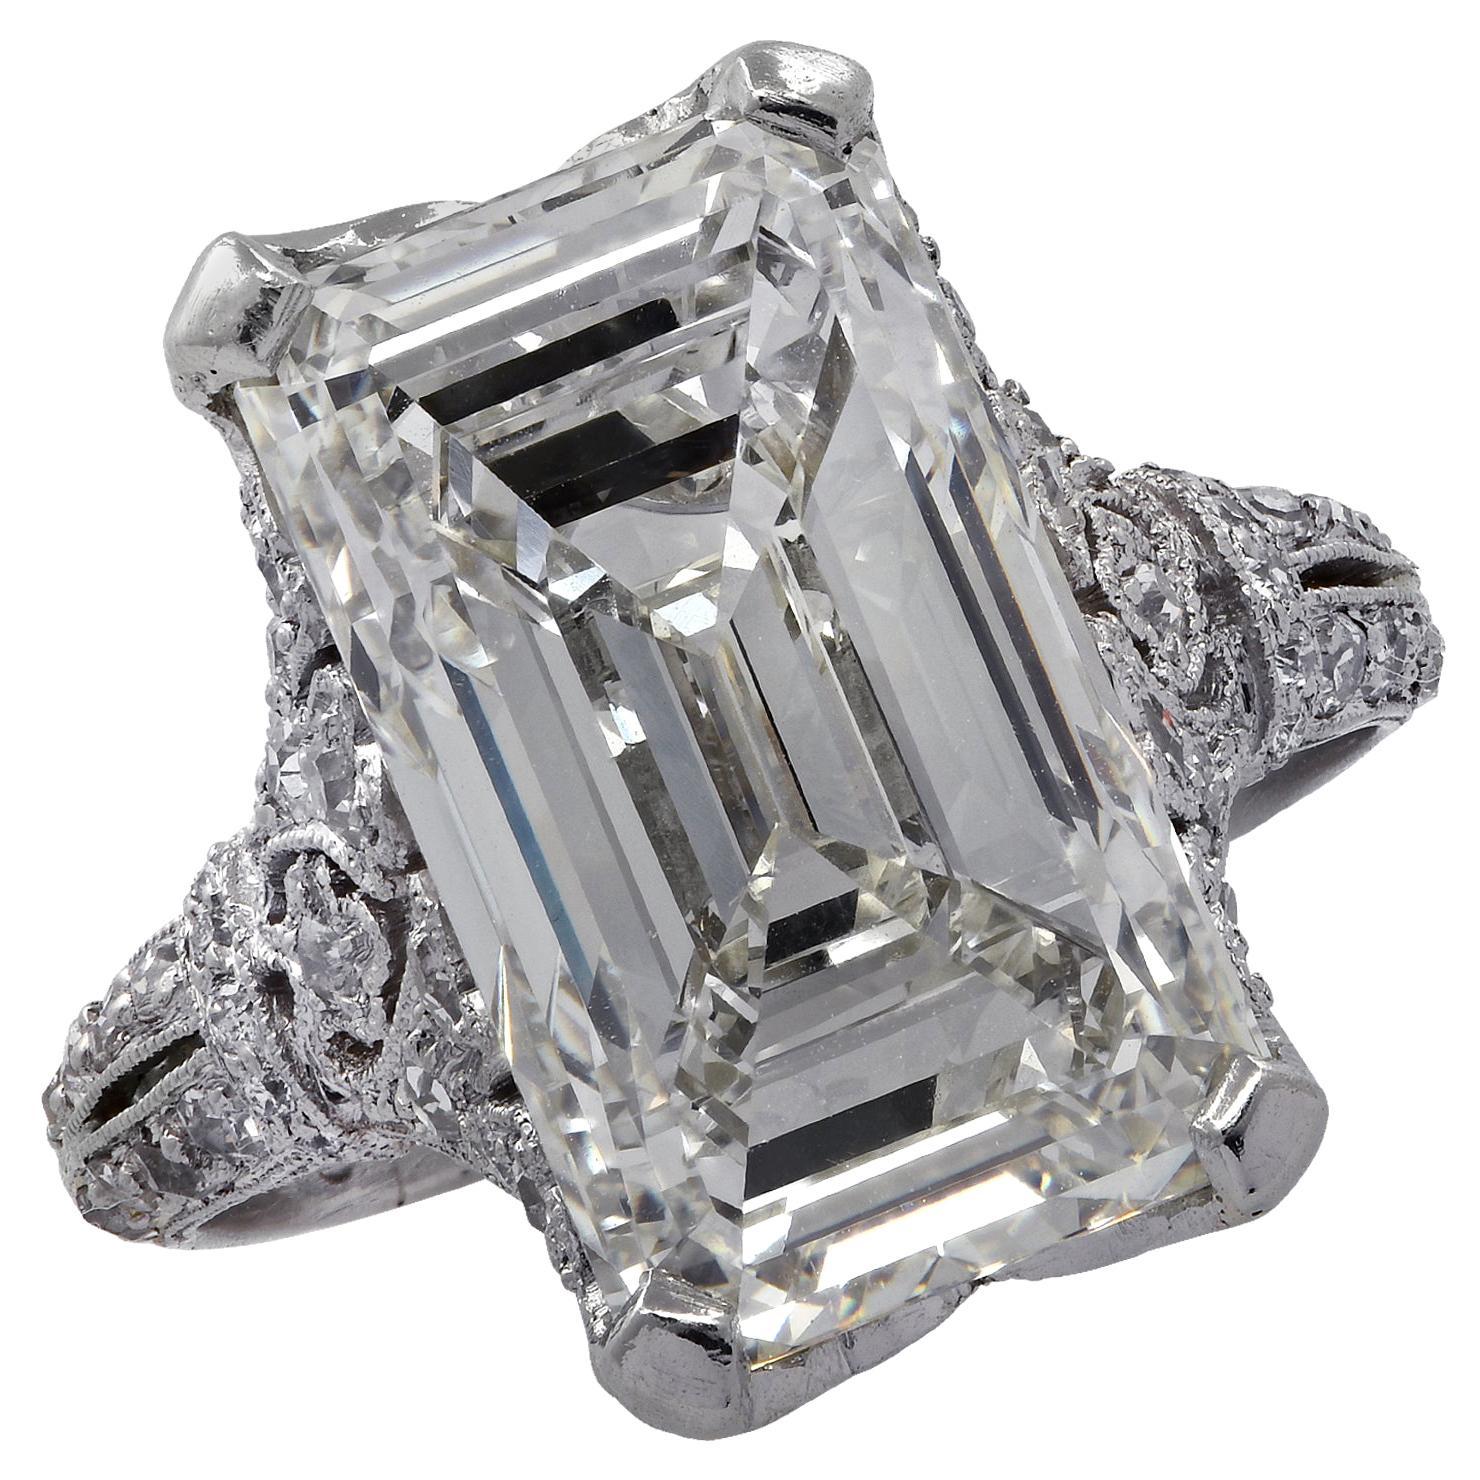 6c1400a12 Vivid Diamonds & Jewelry - Miami, FL 33131 - 1stdibs